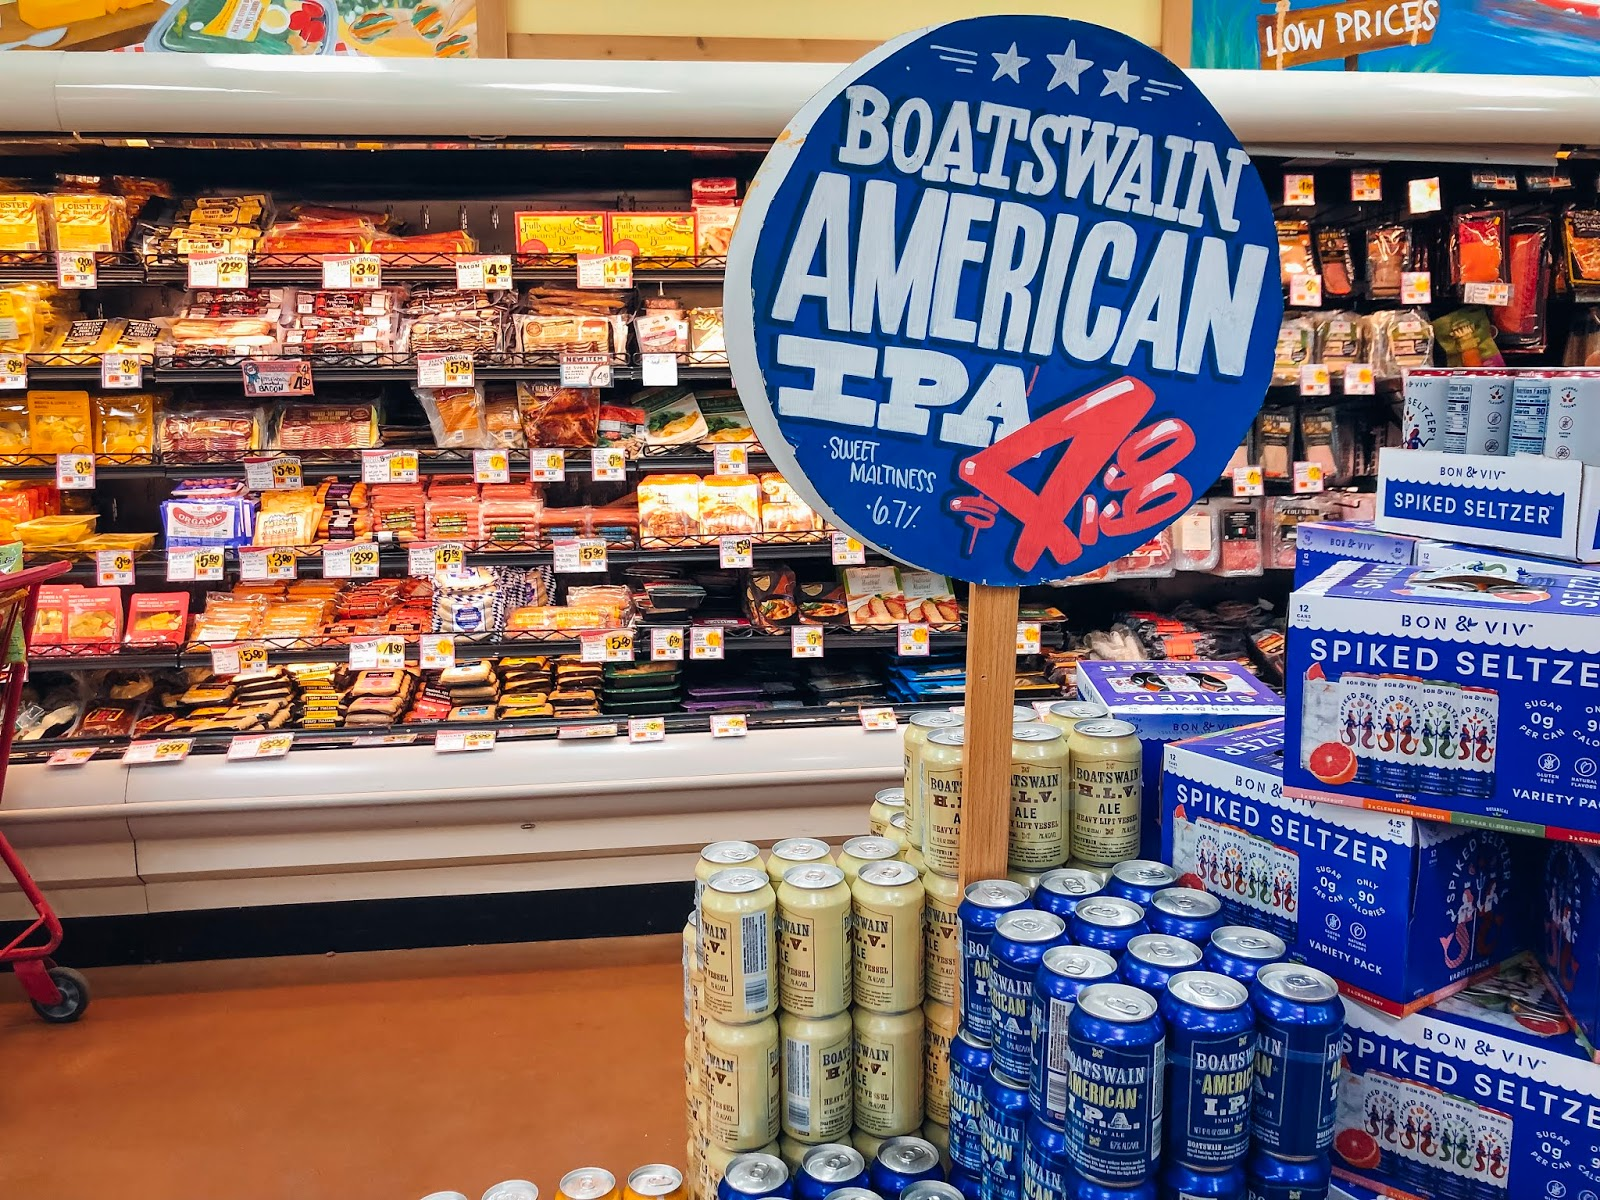 Trader Joe's Boatswain American IPA